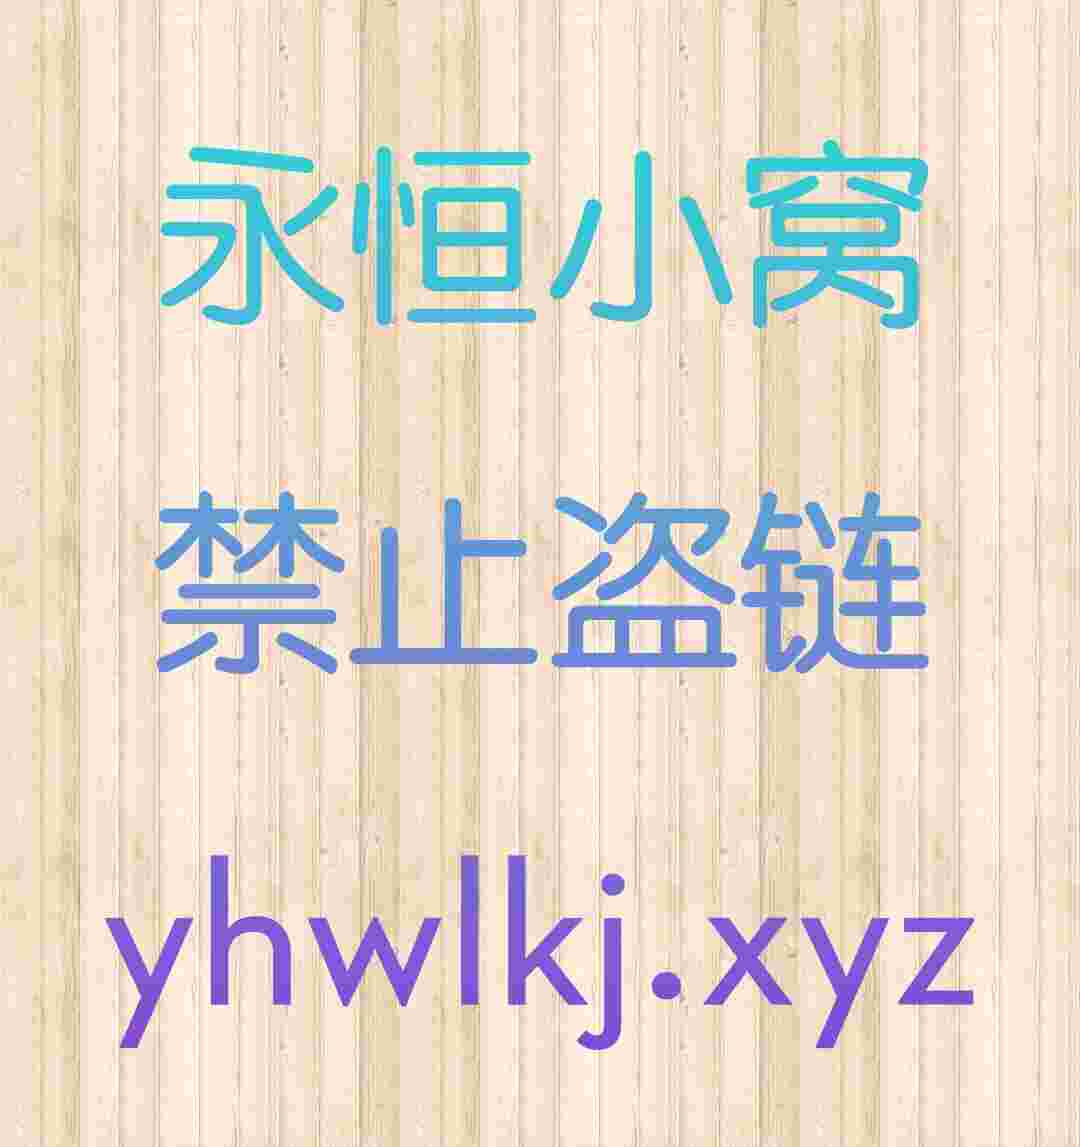 Screenshot_20210224_201234_org.mozilla.firefox_edit_40486439789133.jpg